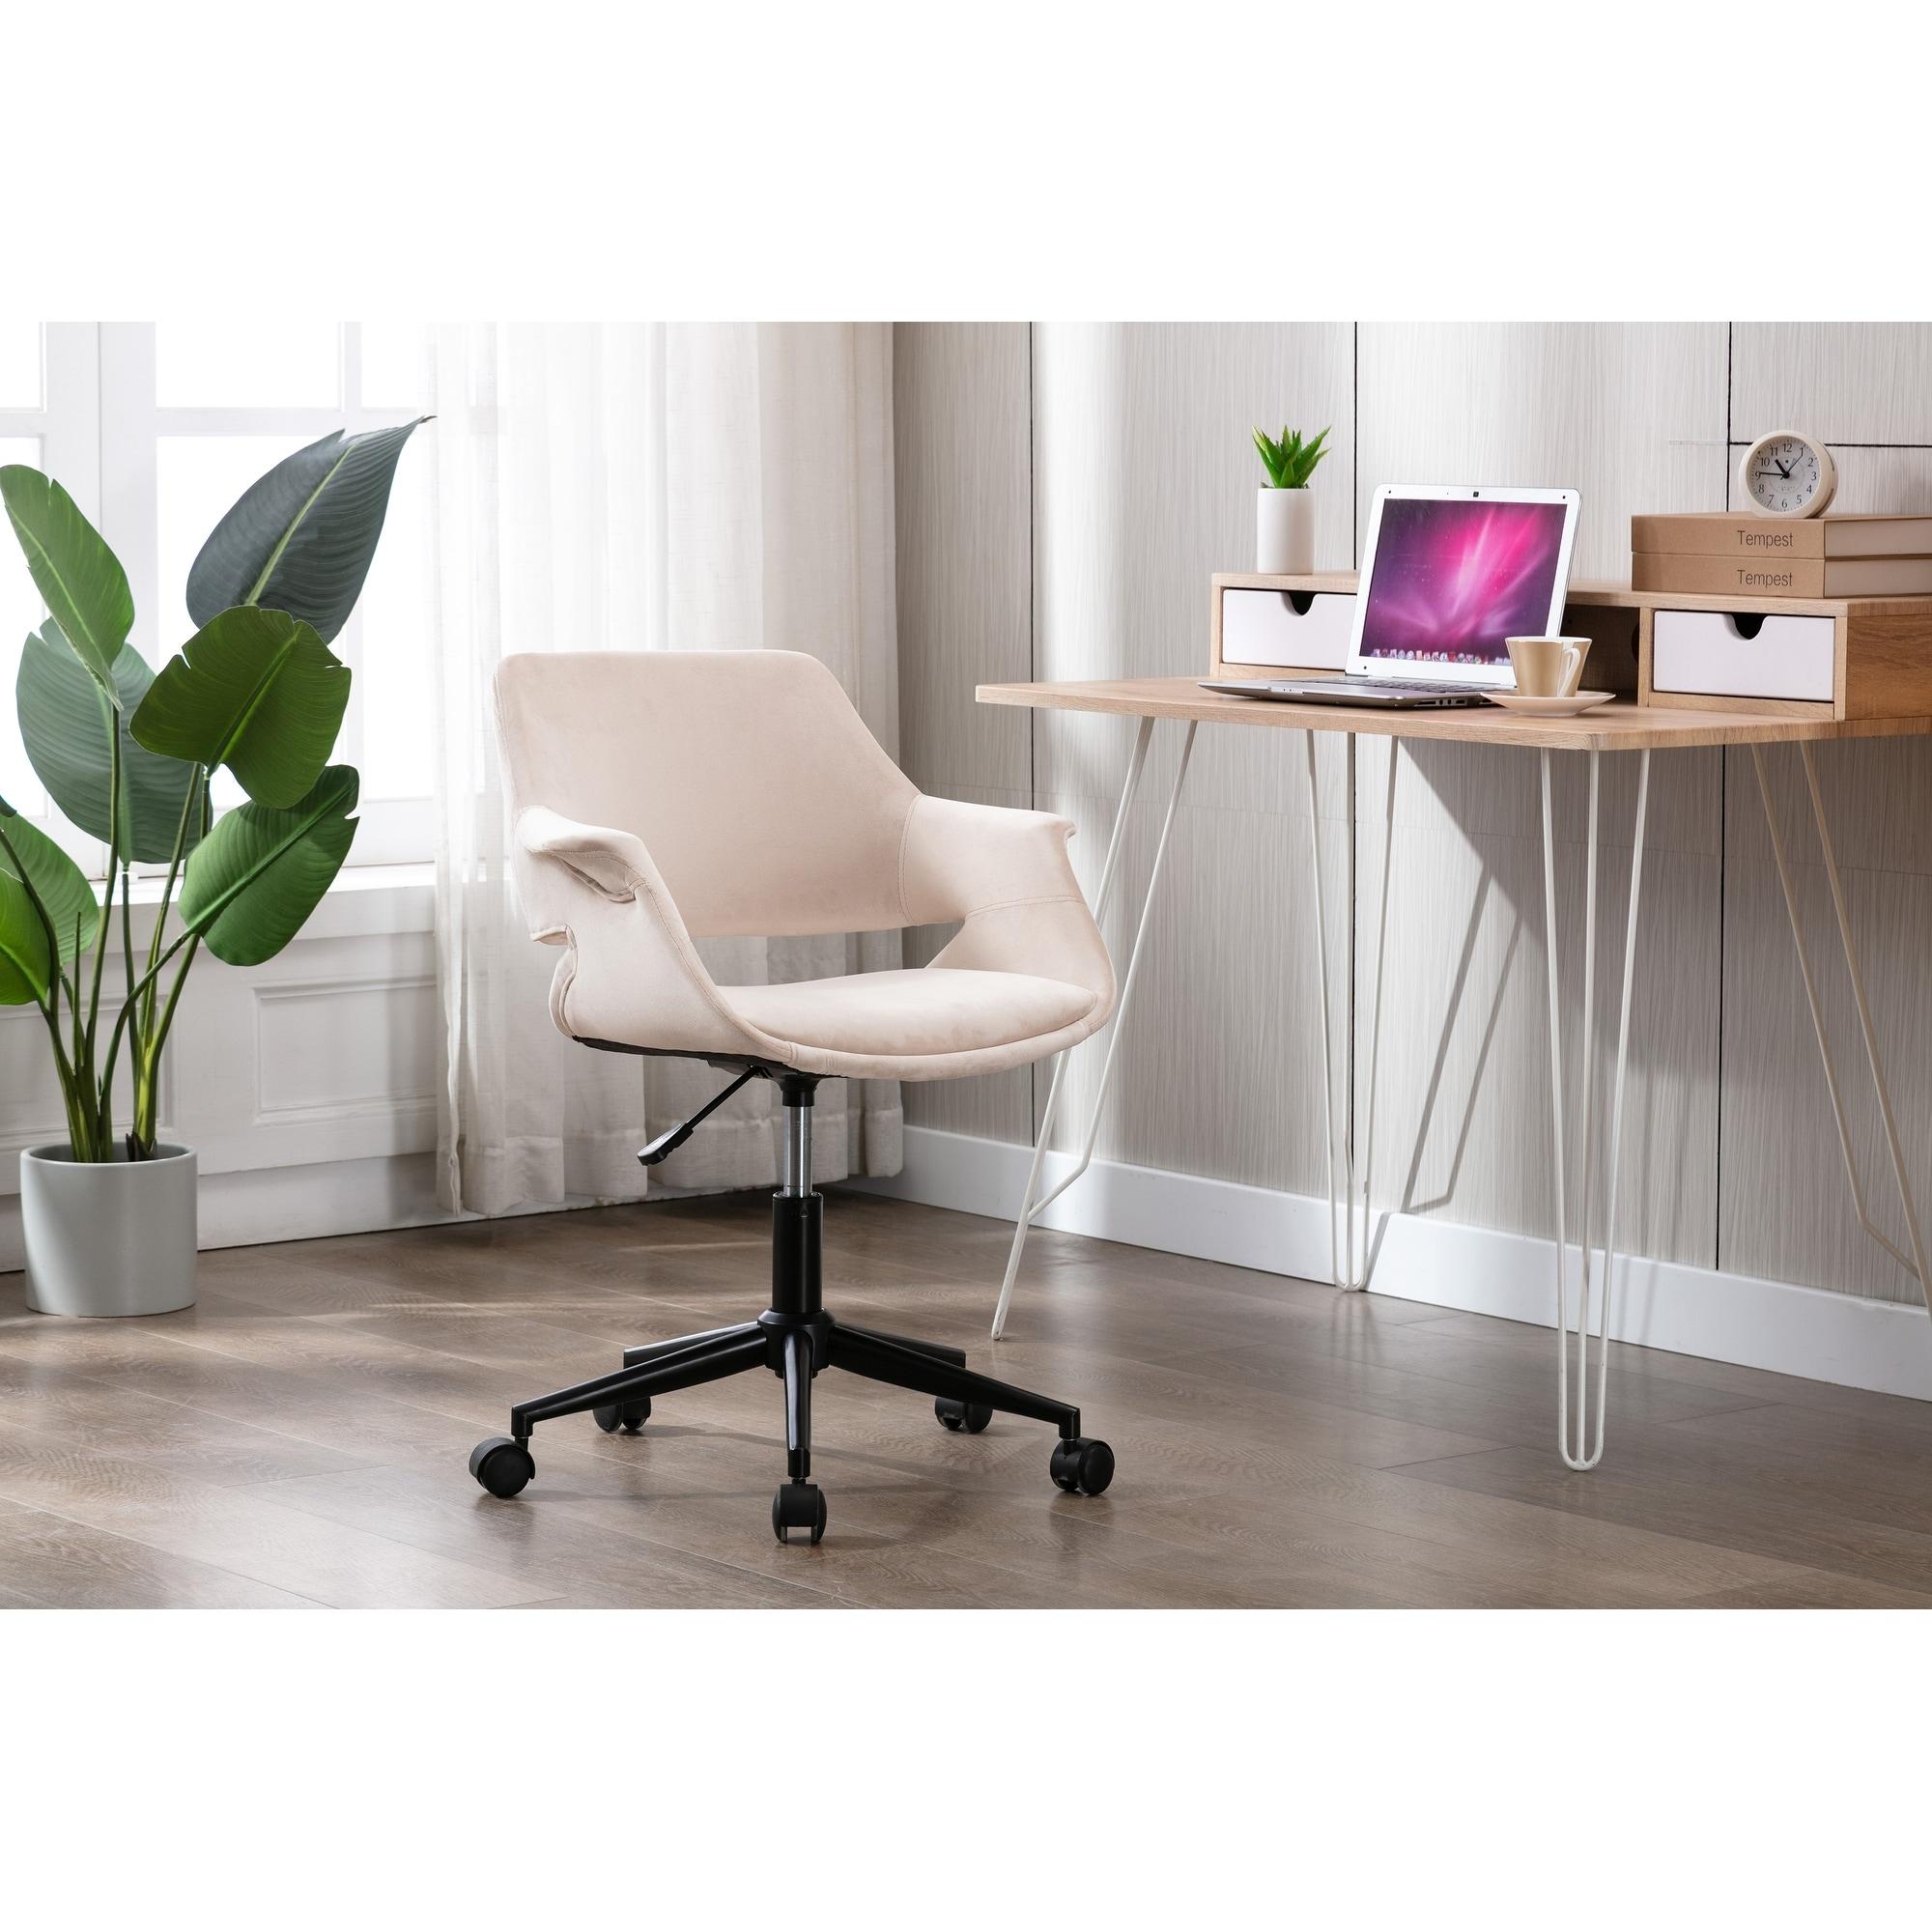 Shop Porthos Home Rylee Swivel Office Chair Velvet Adjustable Height On Sale Overstock 31606404 Pink